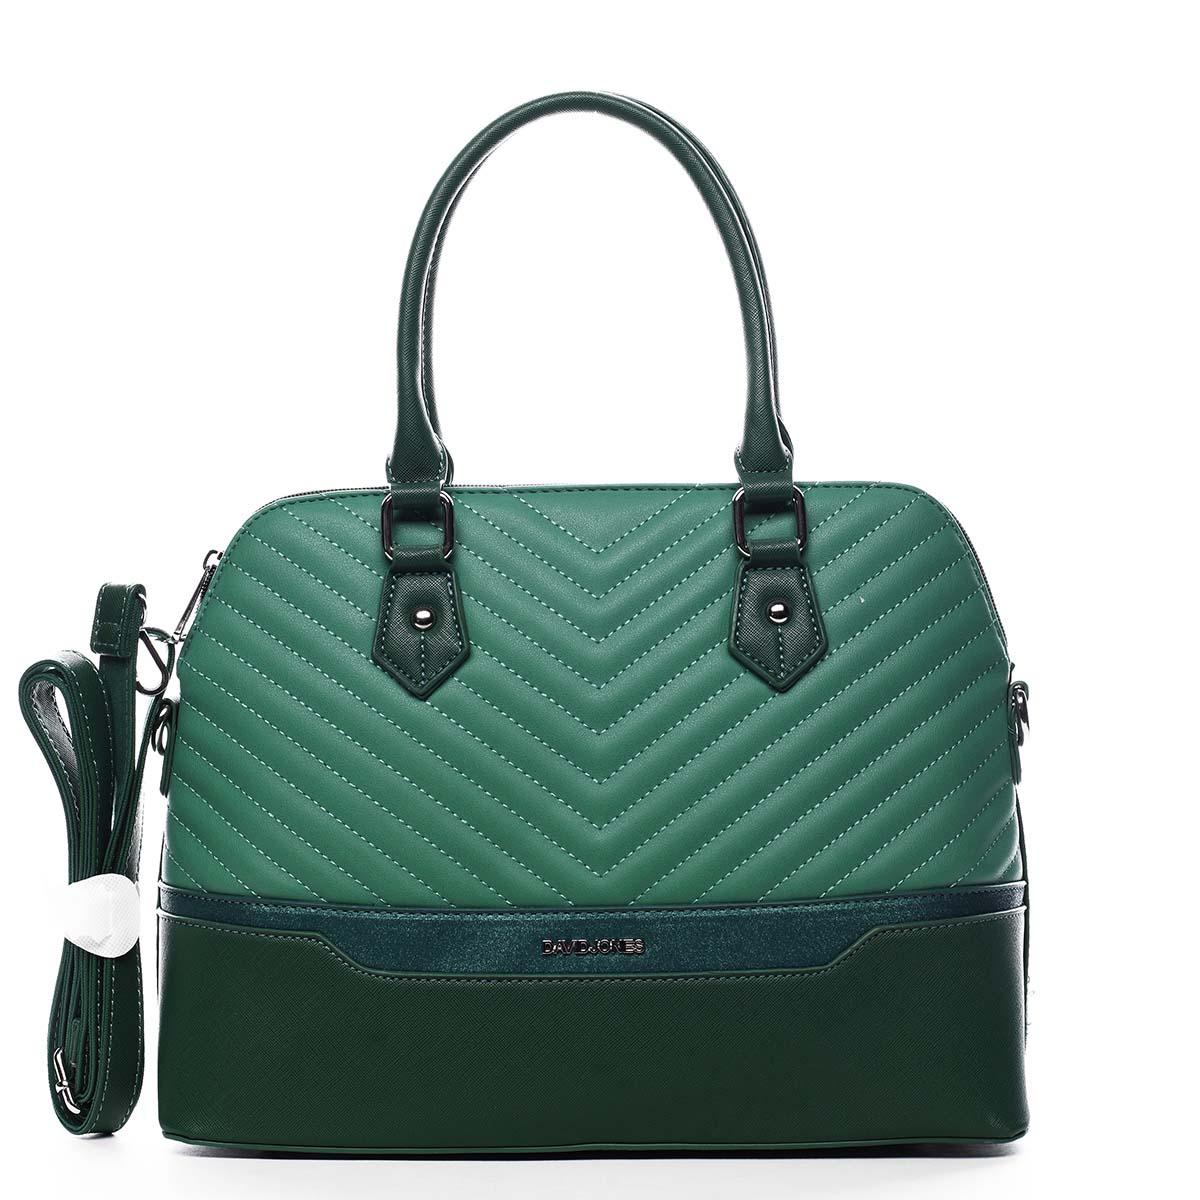 Dámská kabelka do ruky zelená - David Jones Roshel